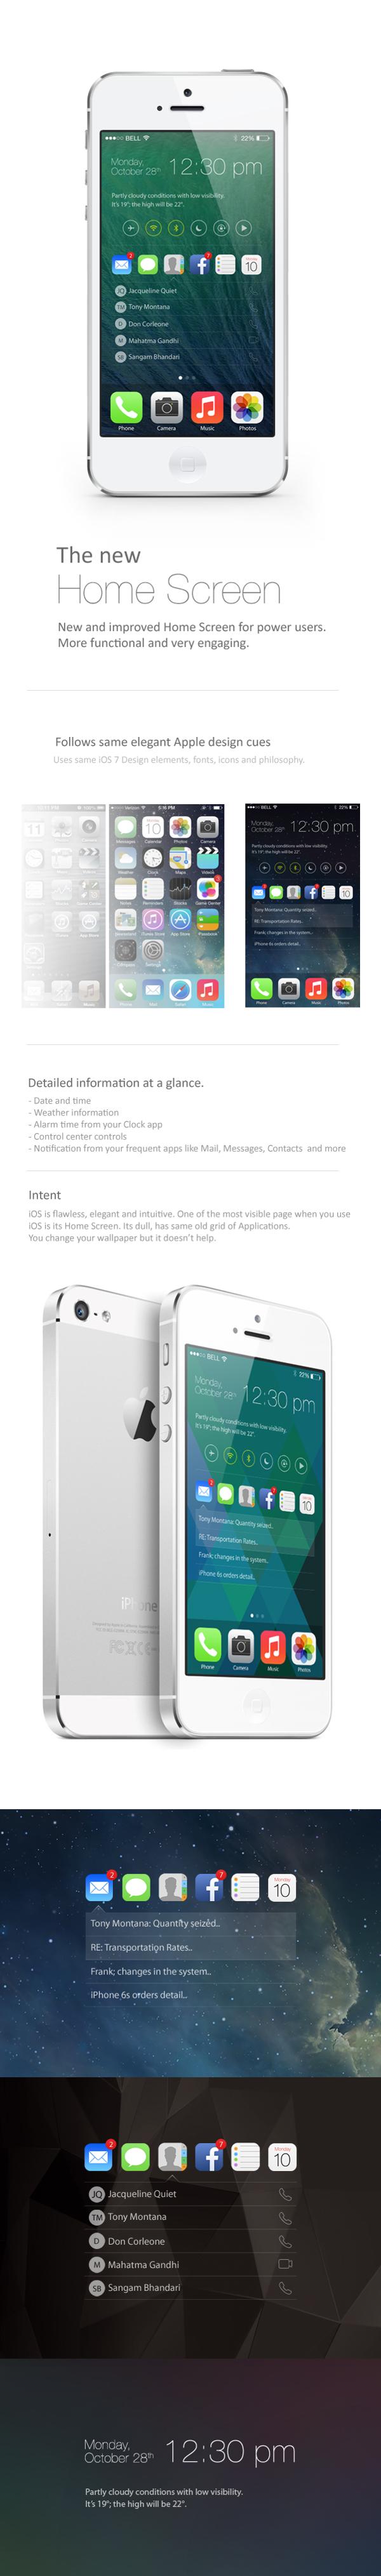 iOS 8 concept chart